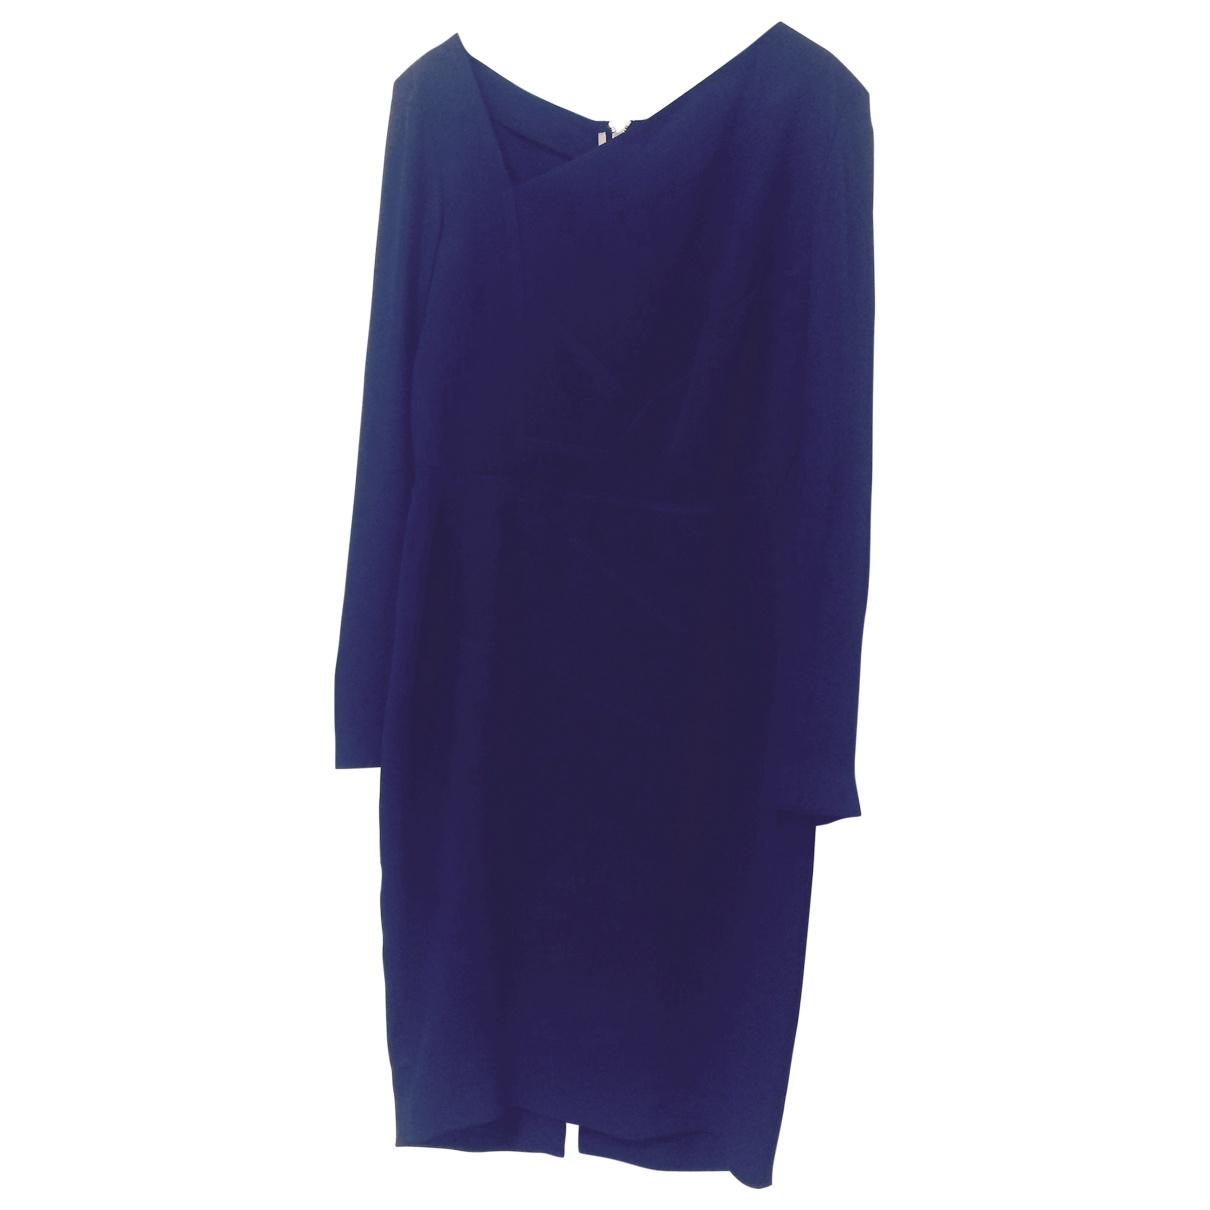 Roland Mouret \N Kleid in  Lila Synthetik